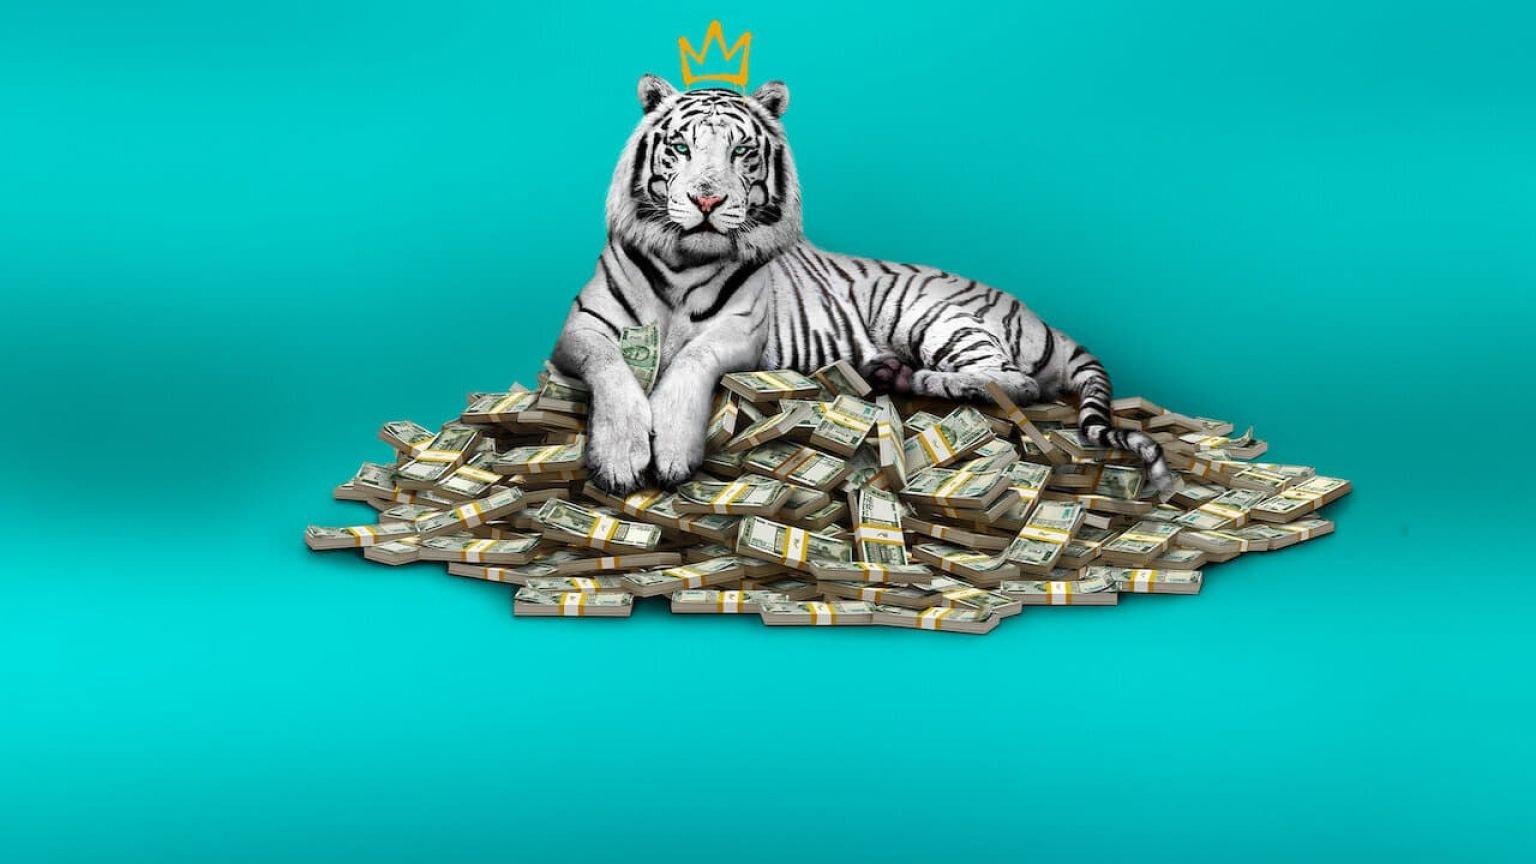 Dramafilm 'The White Tiger' nu te zien op Netflix